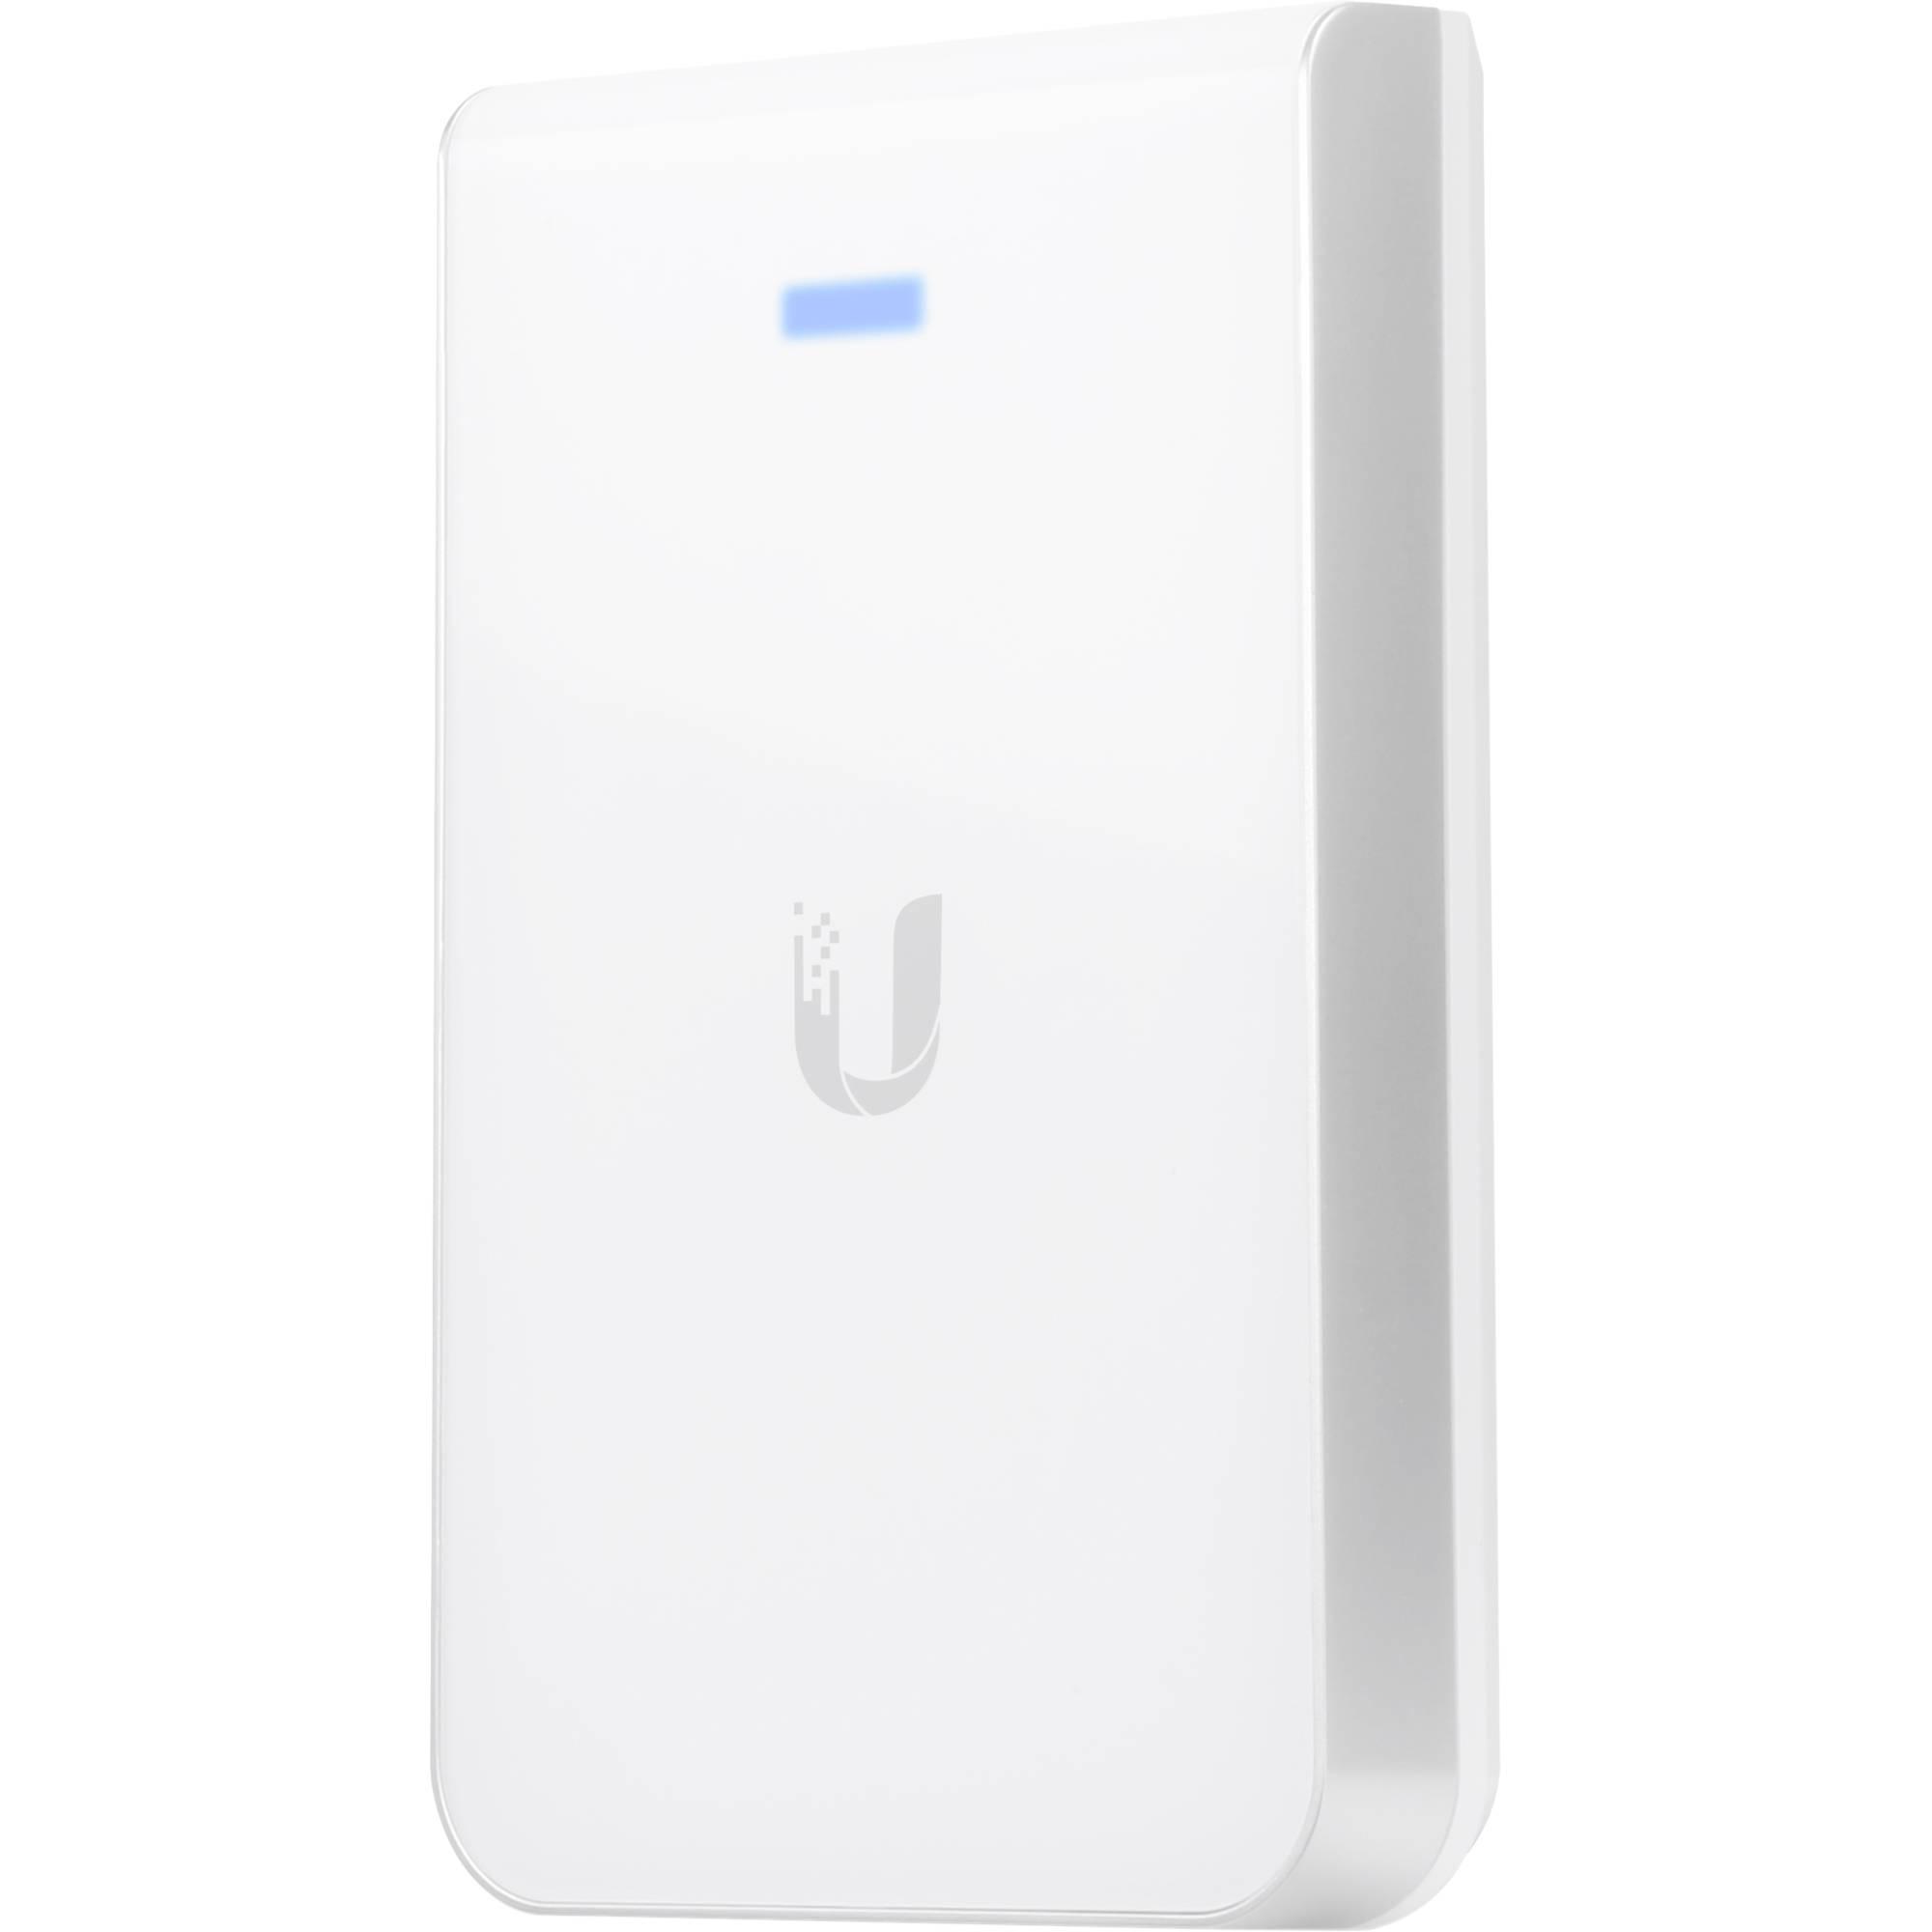 Ubiquiti Networks UAP-AC-PRO-5 UniFi Access Point Enterprise Wi-Fi System  (5-Pack)